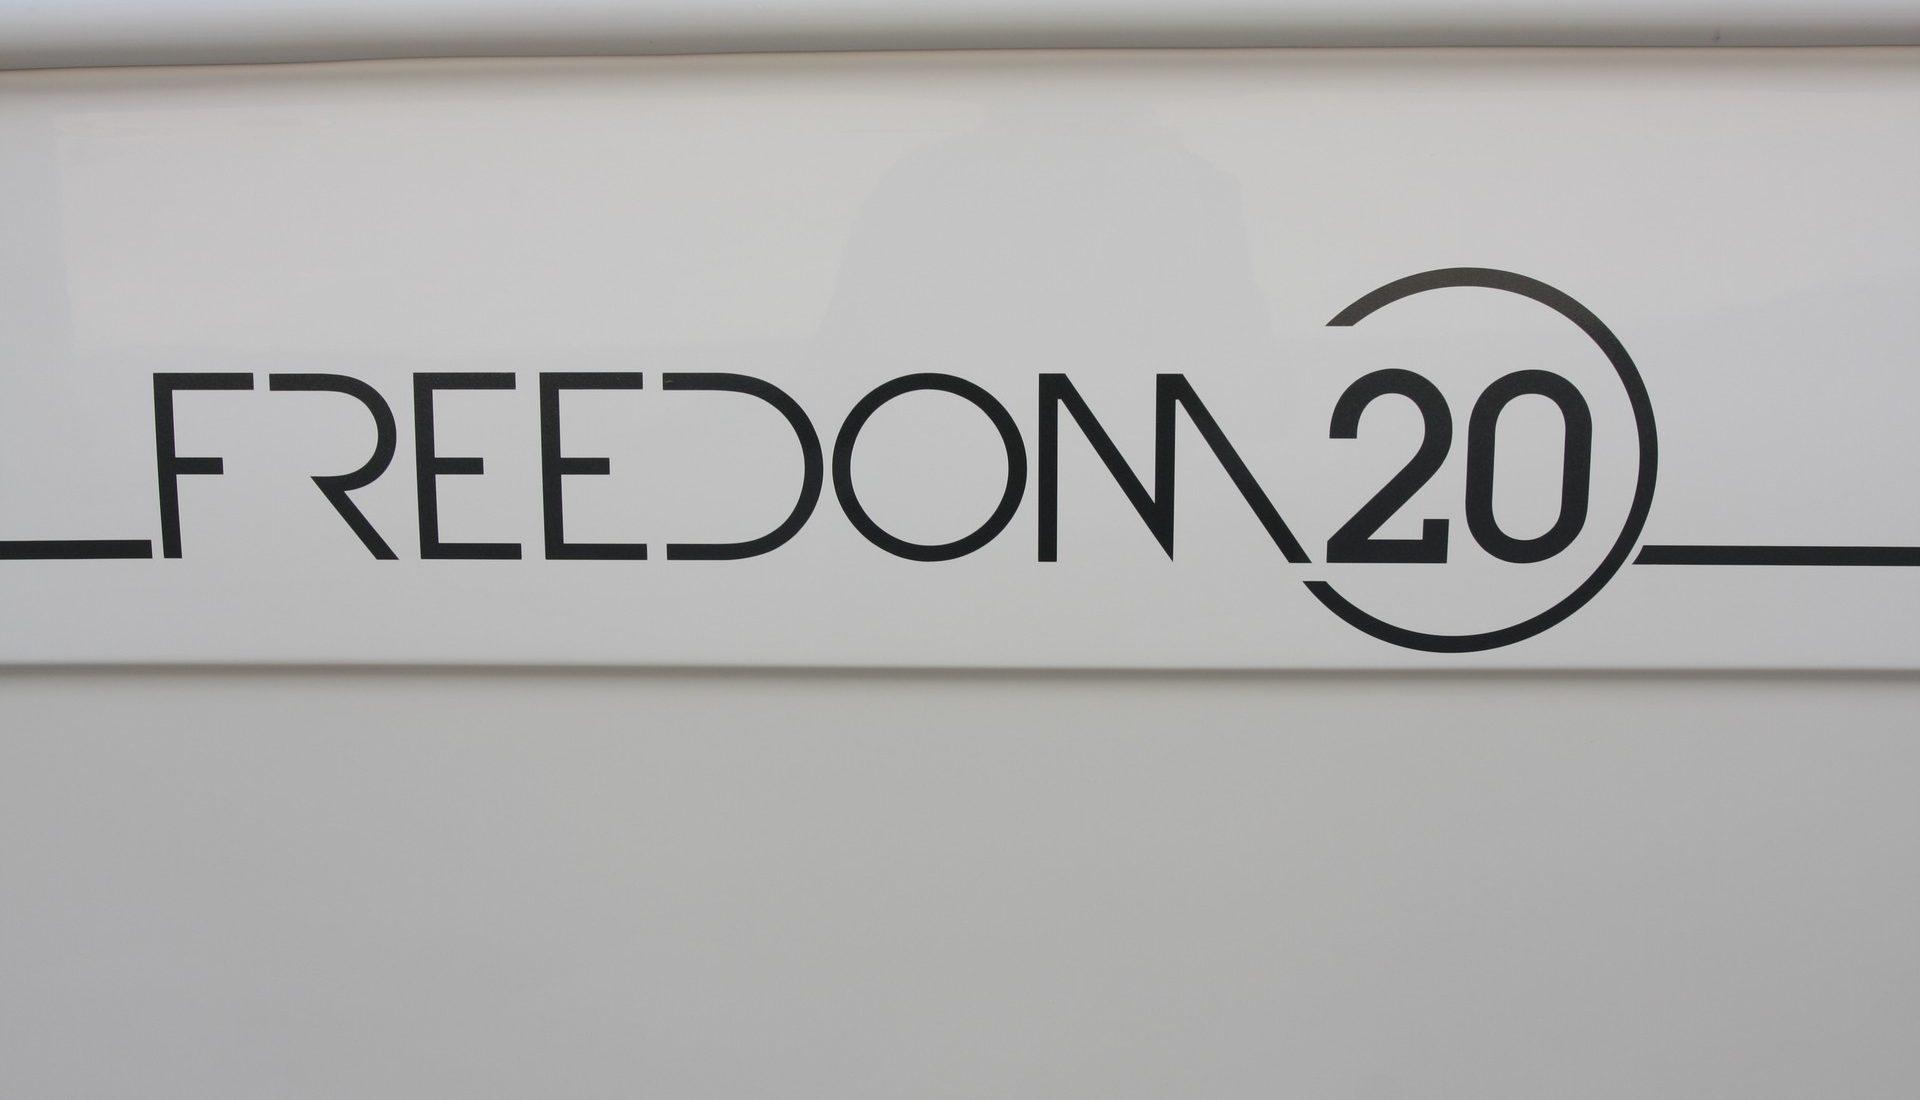 freedom205